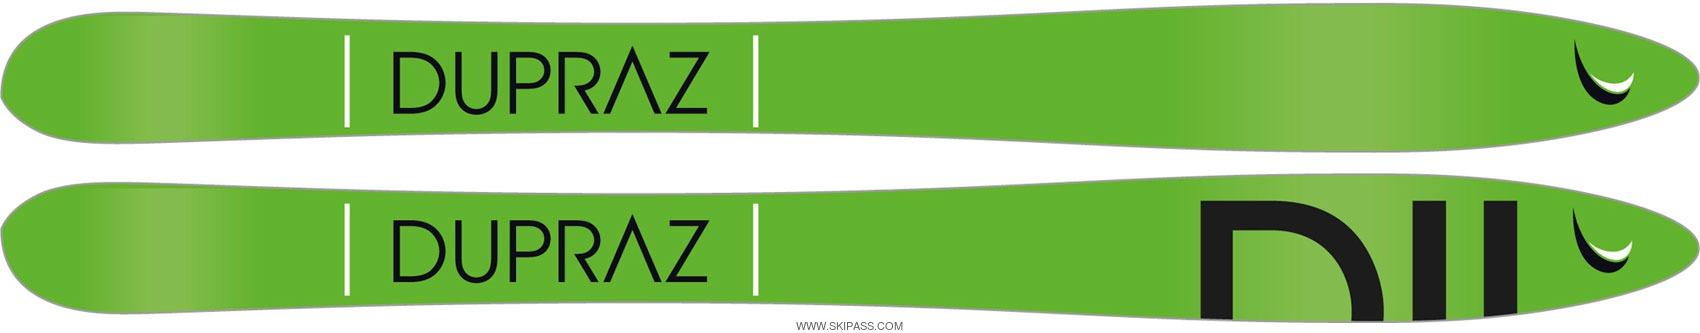 Dupraz W series